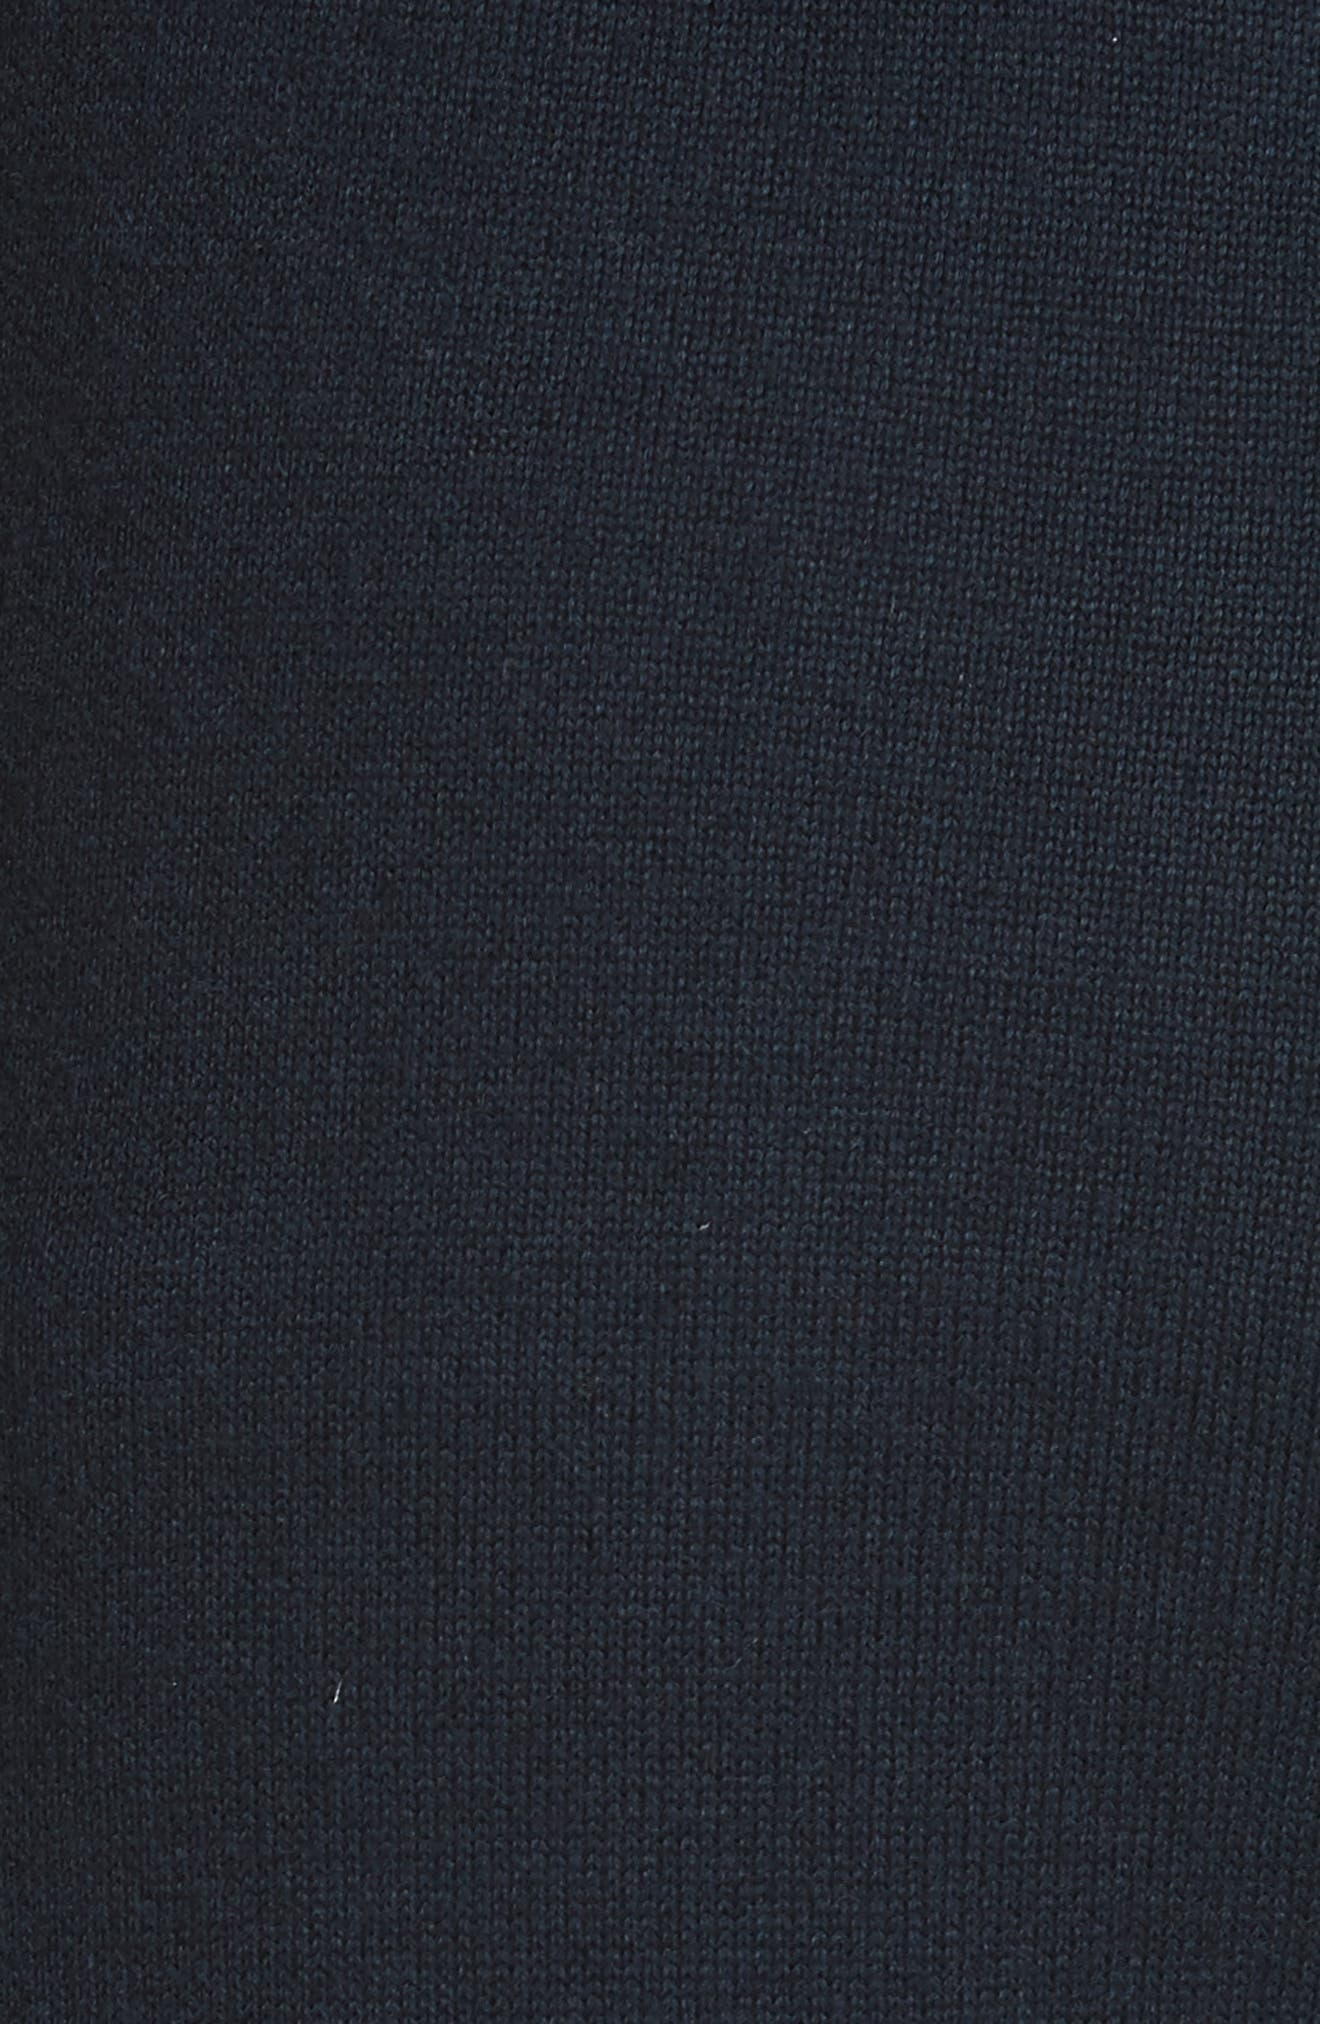 Performance Cashmere Blend Lounge Pants,                             Alternate thumbnail 6, color,                             Tory Navy